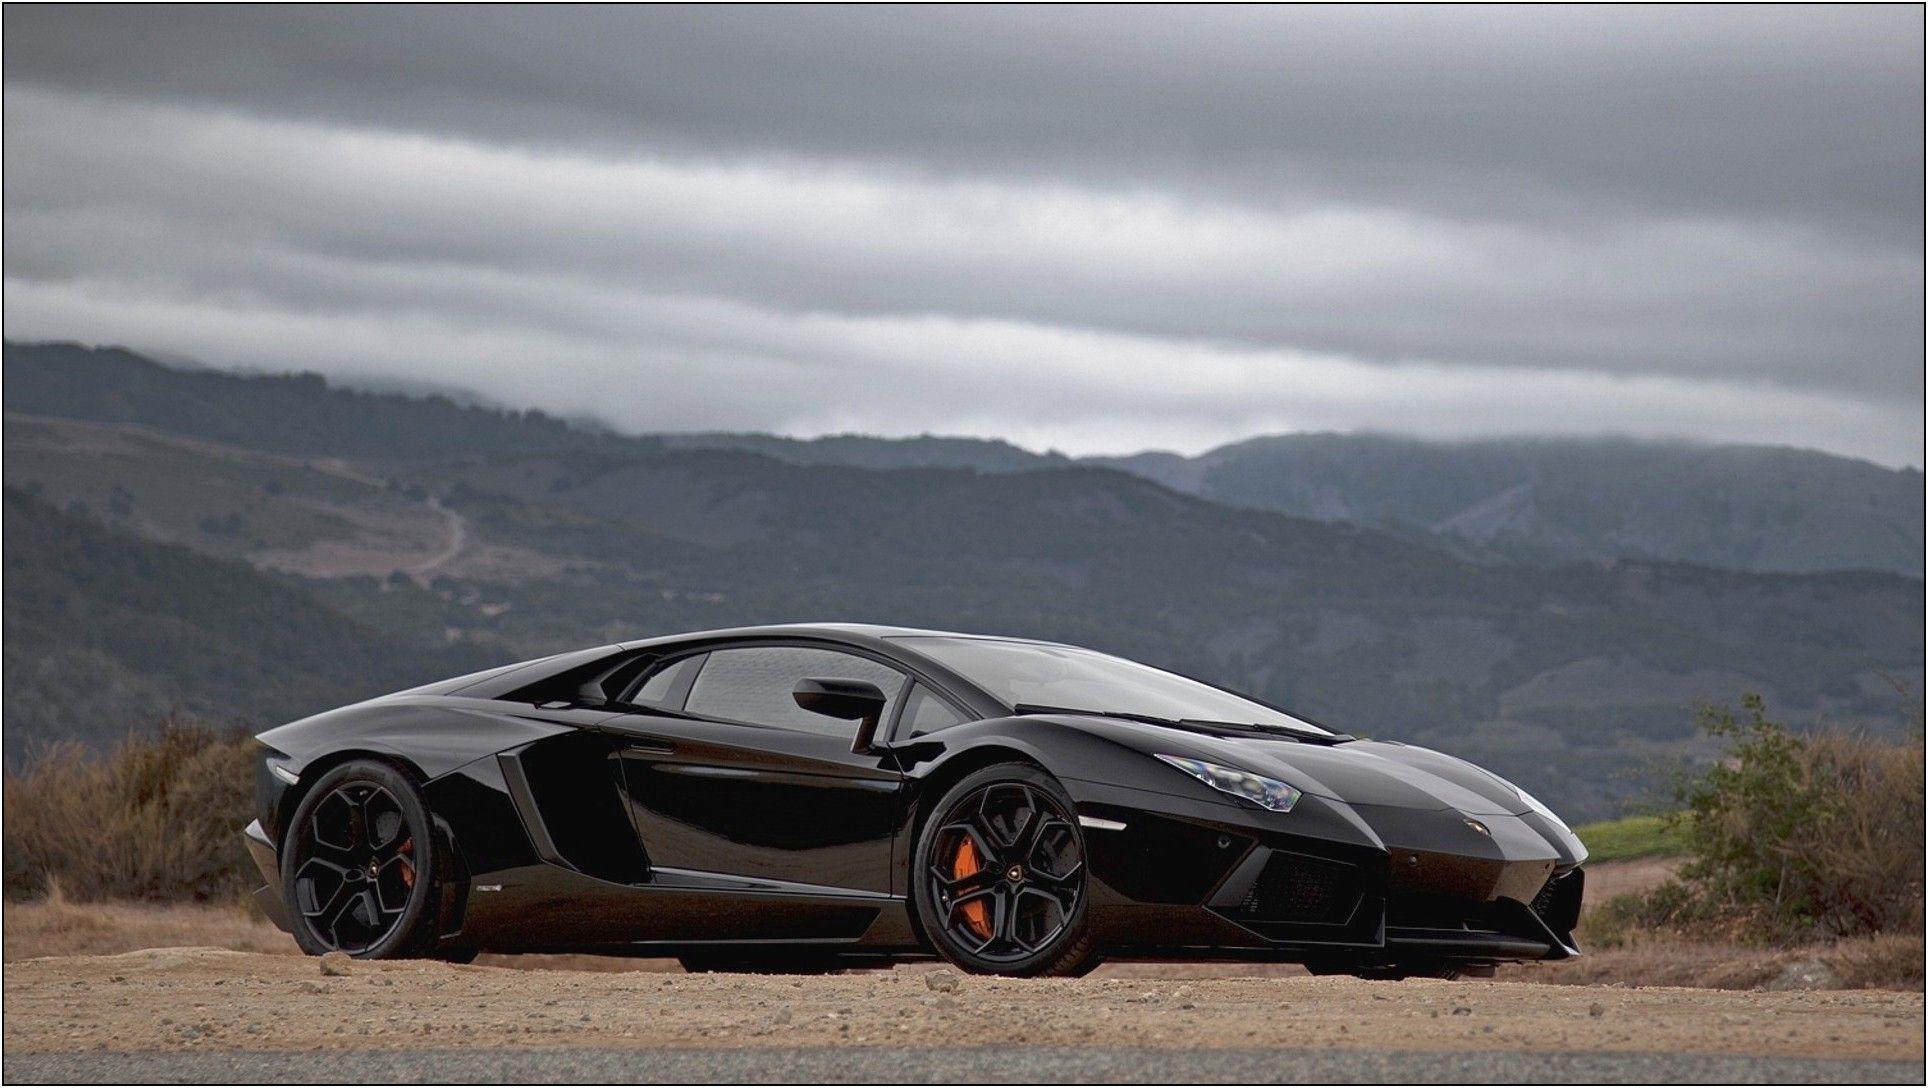 Good Lamborghini Murcielago Wallpaper Free Download    Https://www.twitter.com/Rohmatullah77/status/627122580407853056